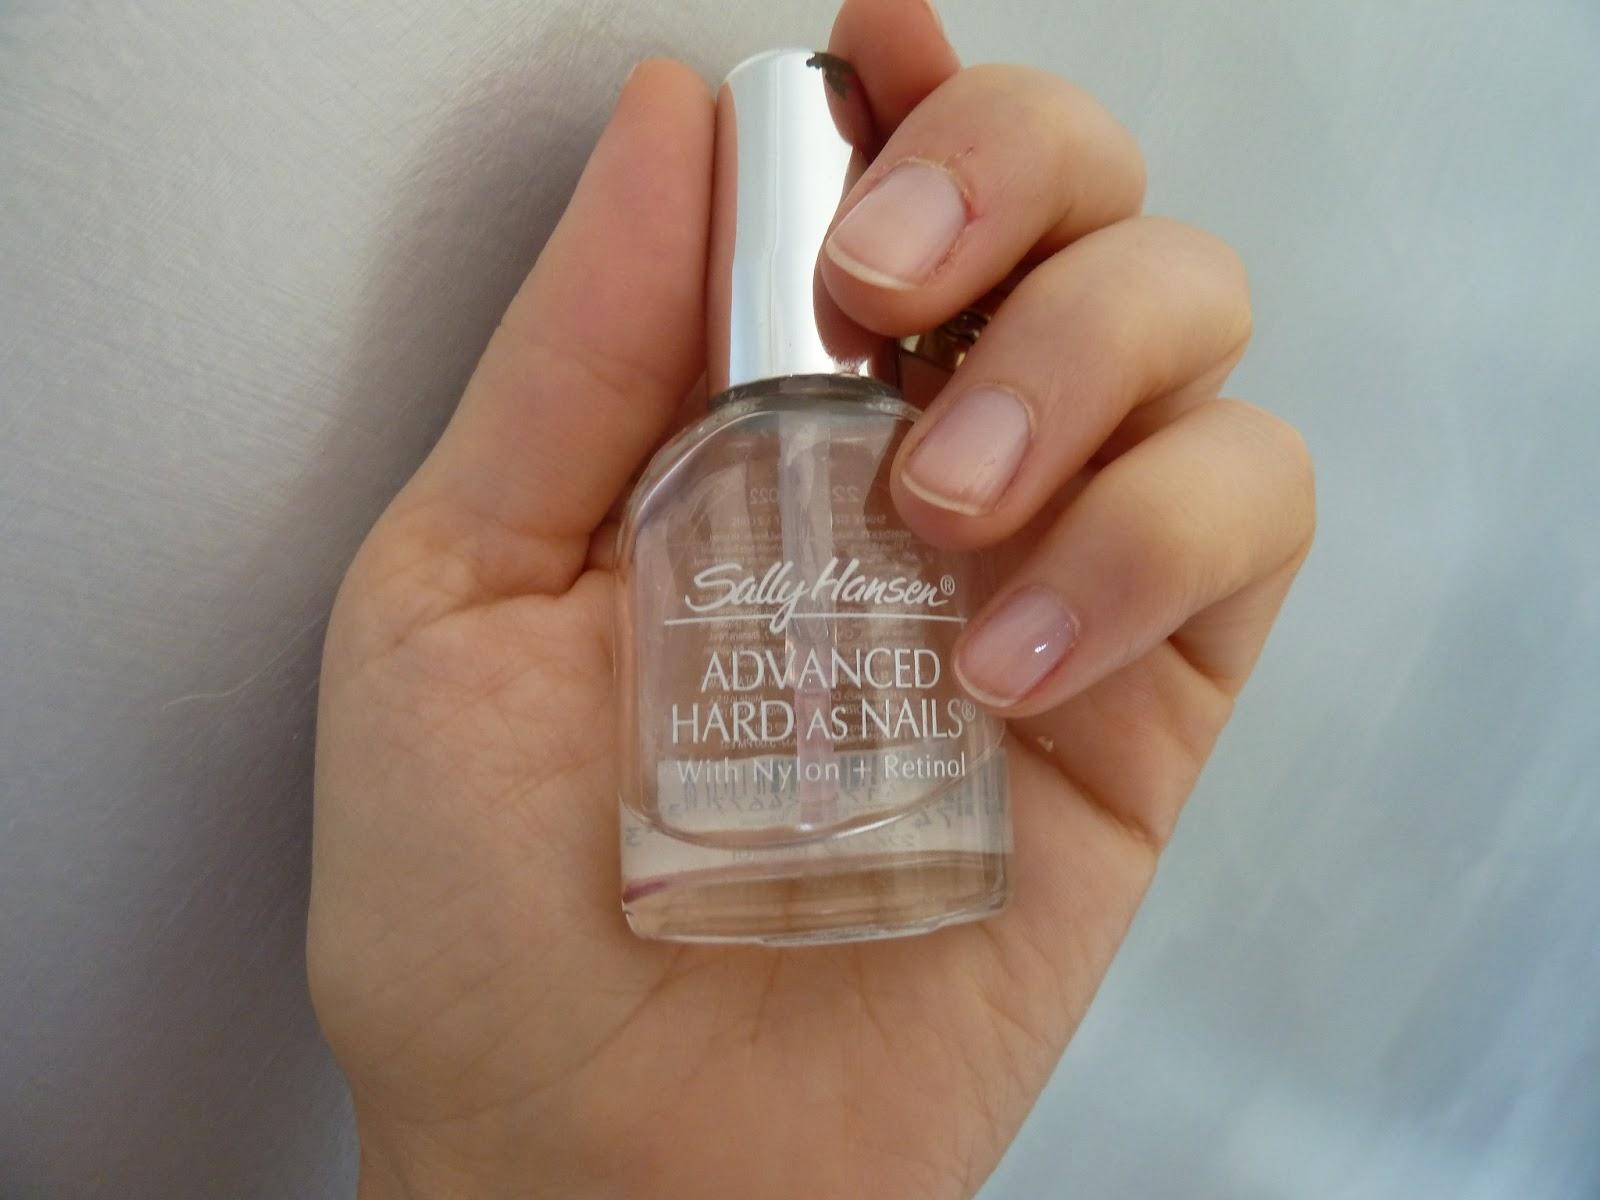 Australian Beauty Review: Product Review: Sally Hansen - Advanced ...